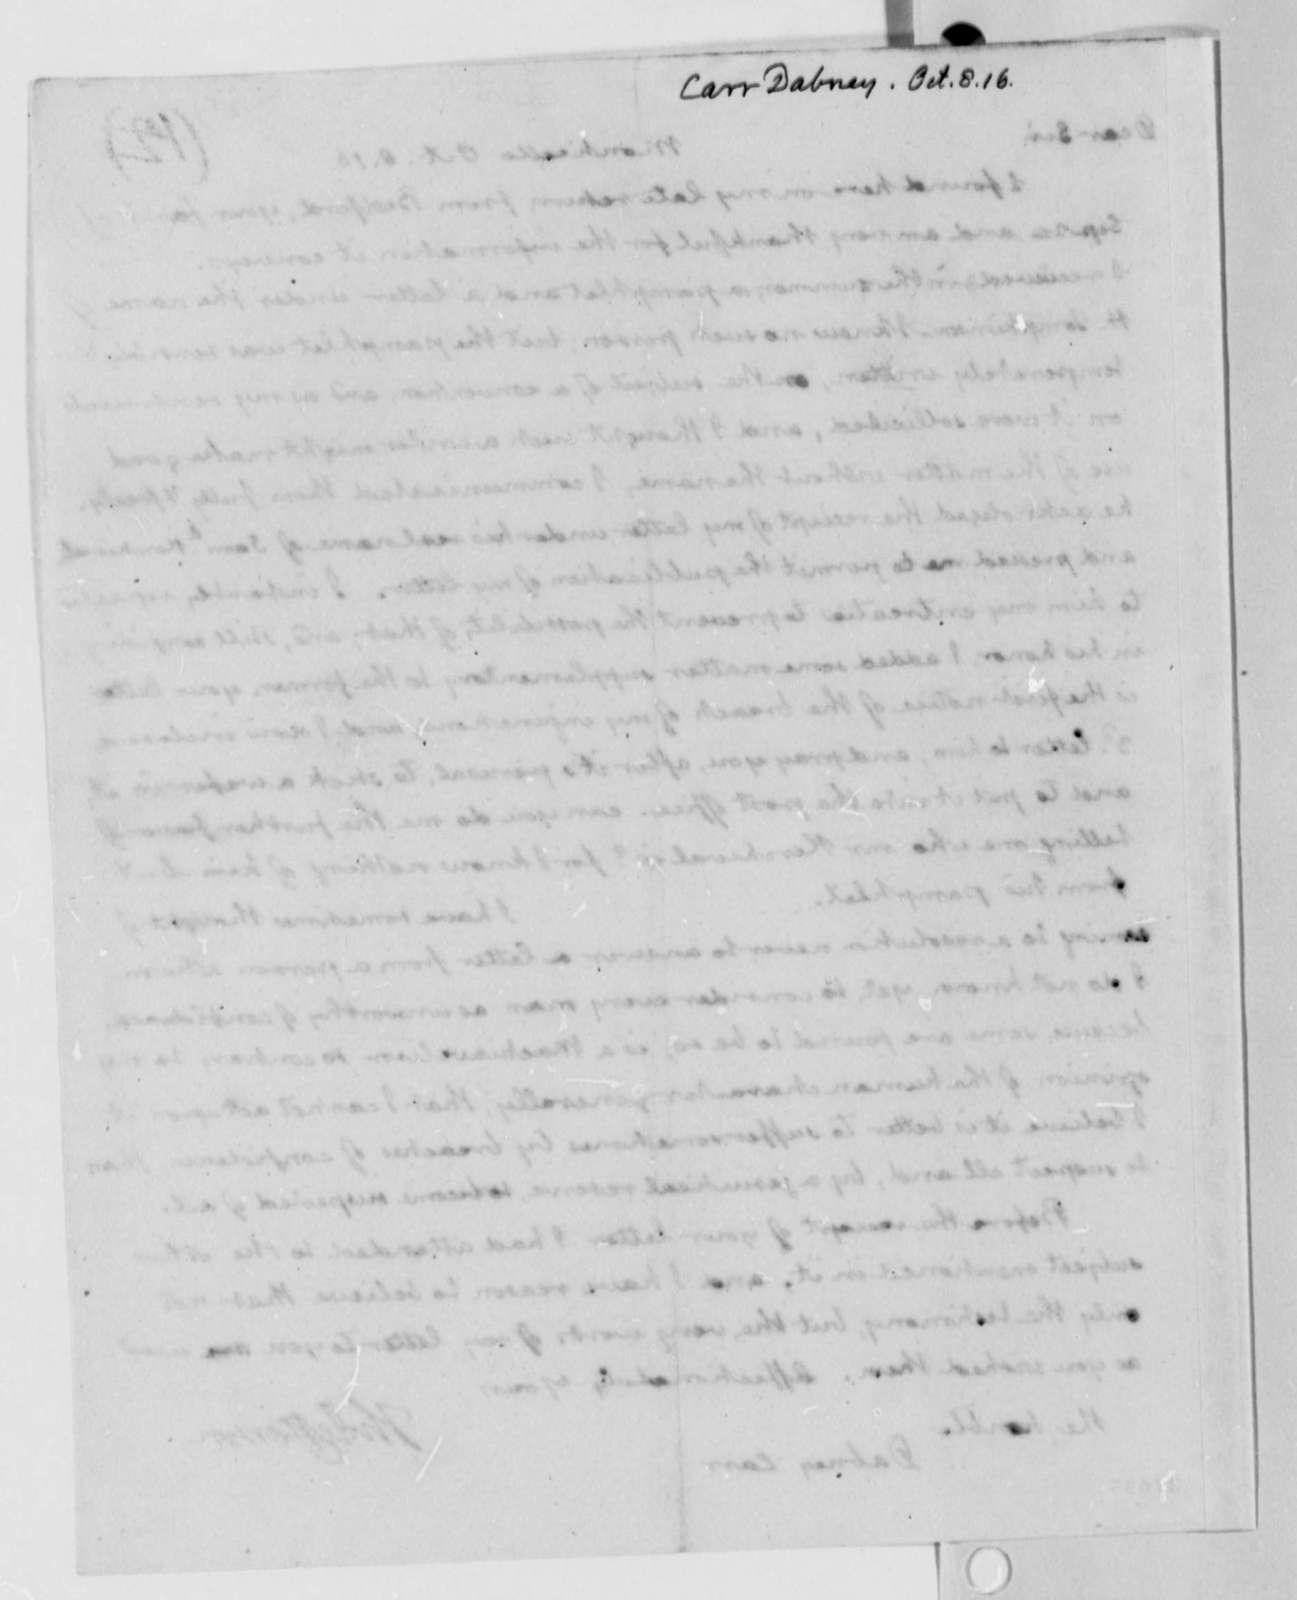 Thomas Jefferson to Dabney Carr, October 8, 1816